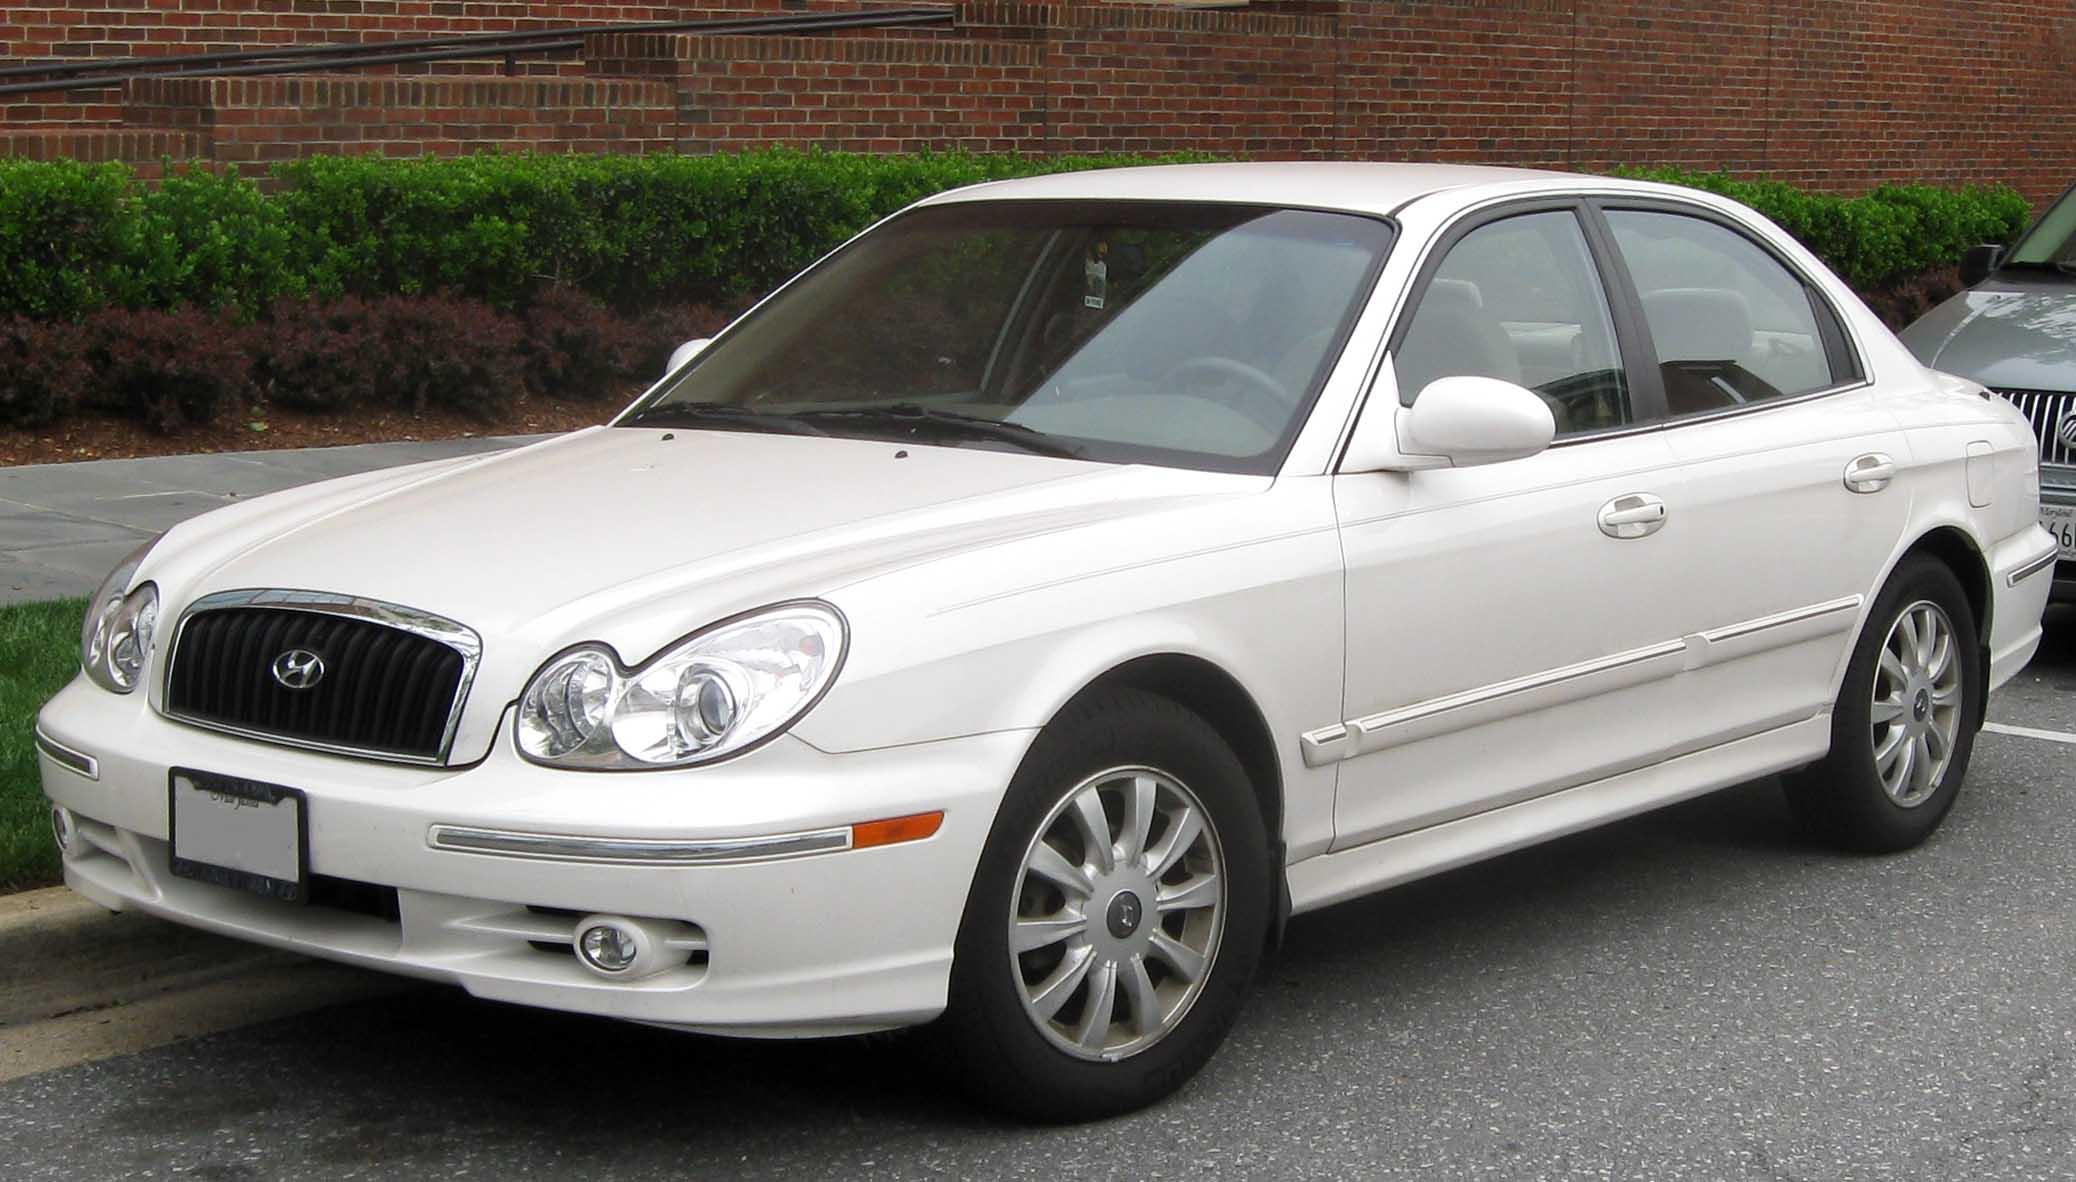 File 02 05 Hyundai Sonata Jpg Wikipedia